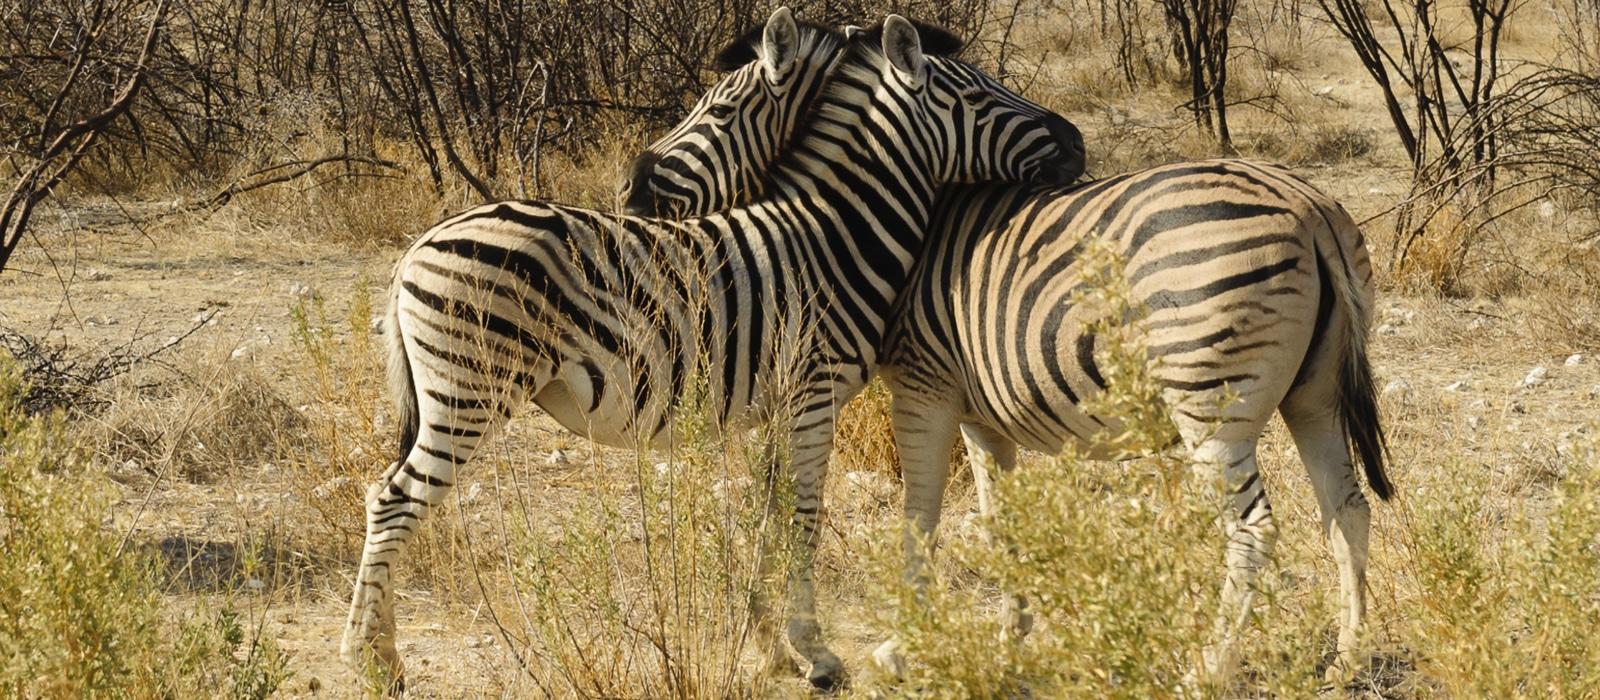 Zèbres, Etosha, Himba, Namibie - les Routes du Monde